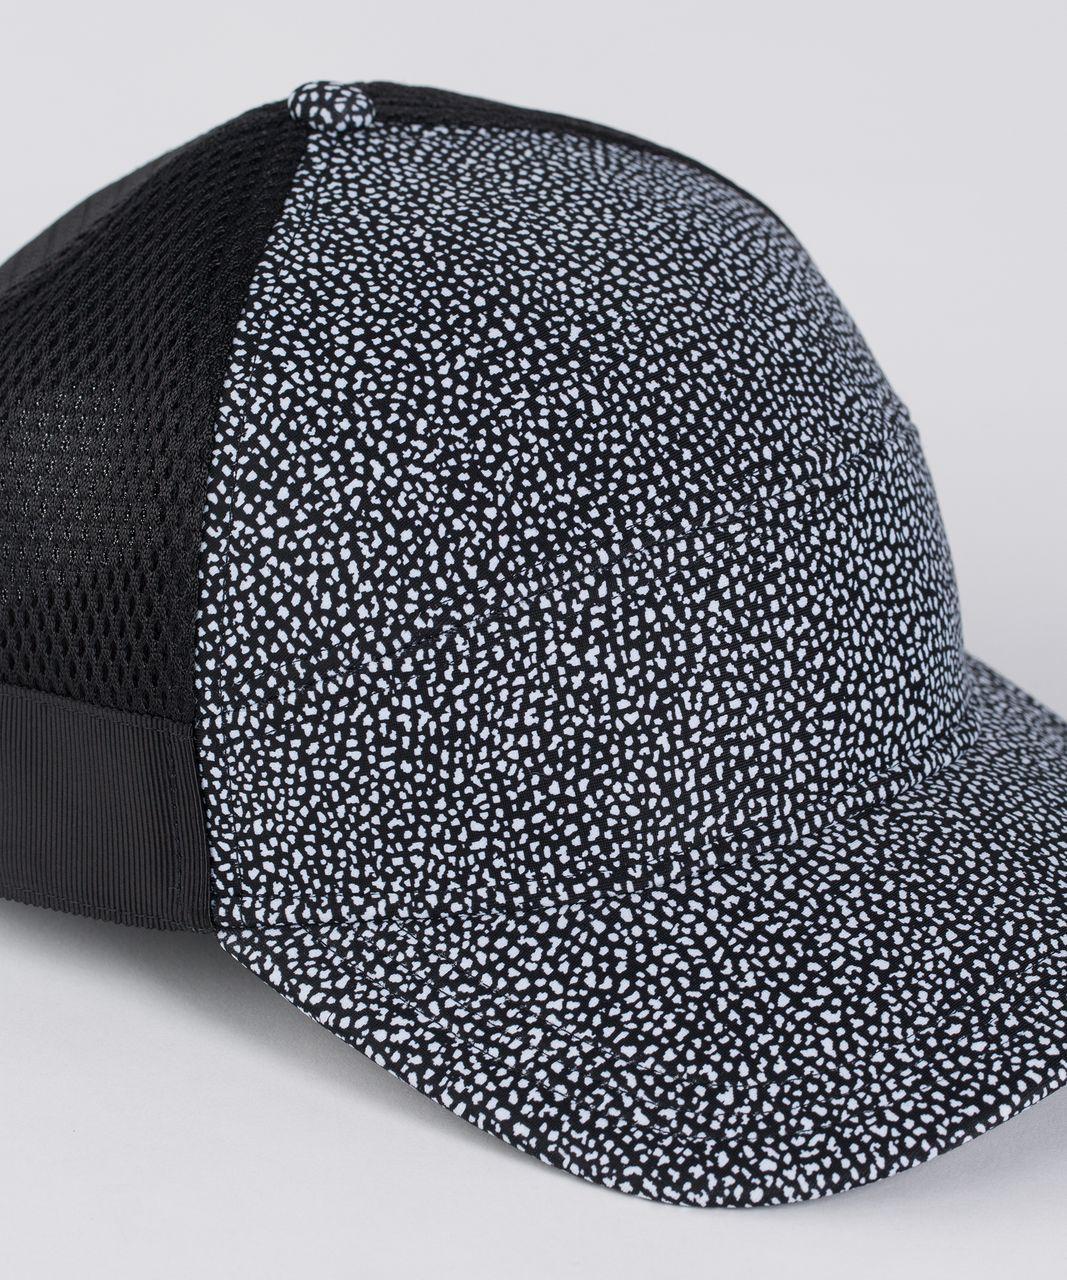 Lululemon Dash And Splash Cap - Chakra Print Alpine White Black / Black